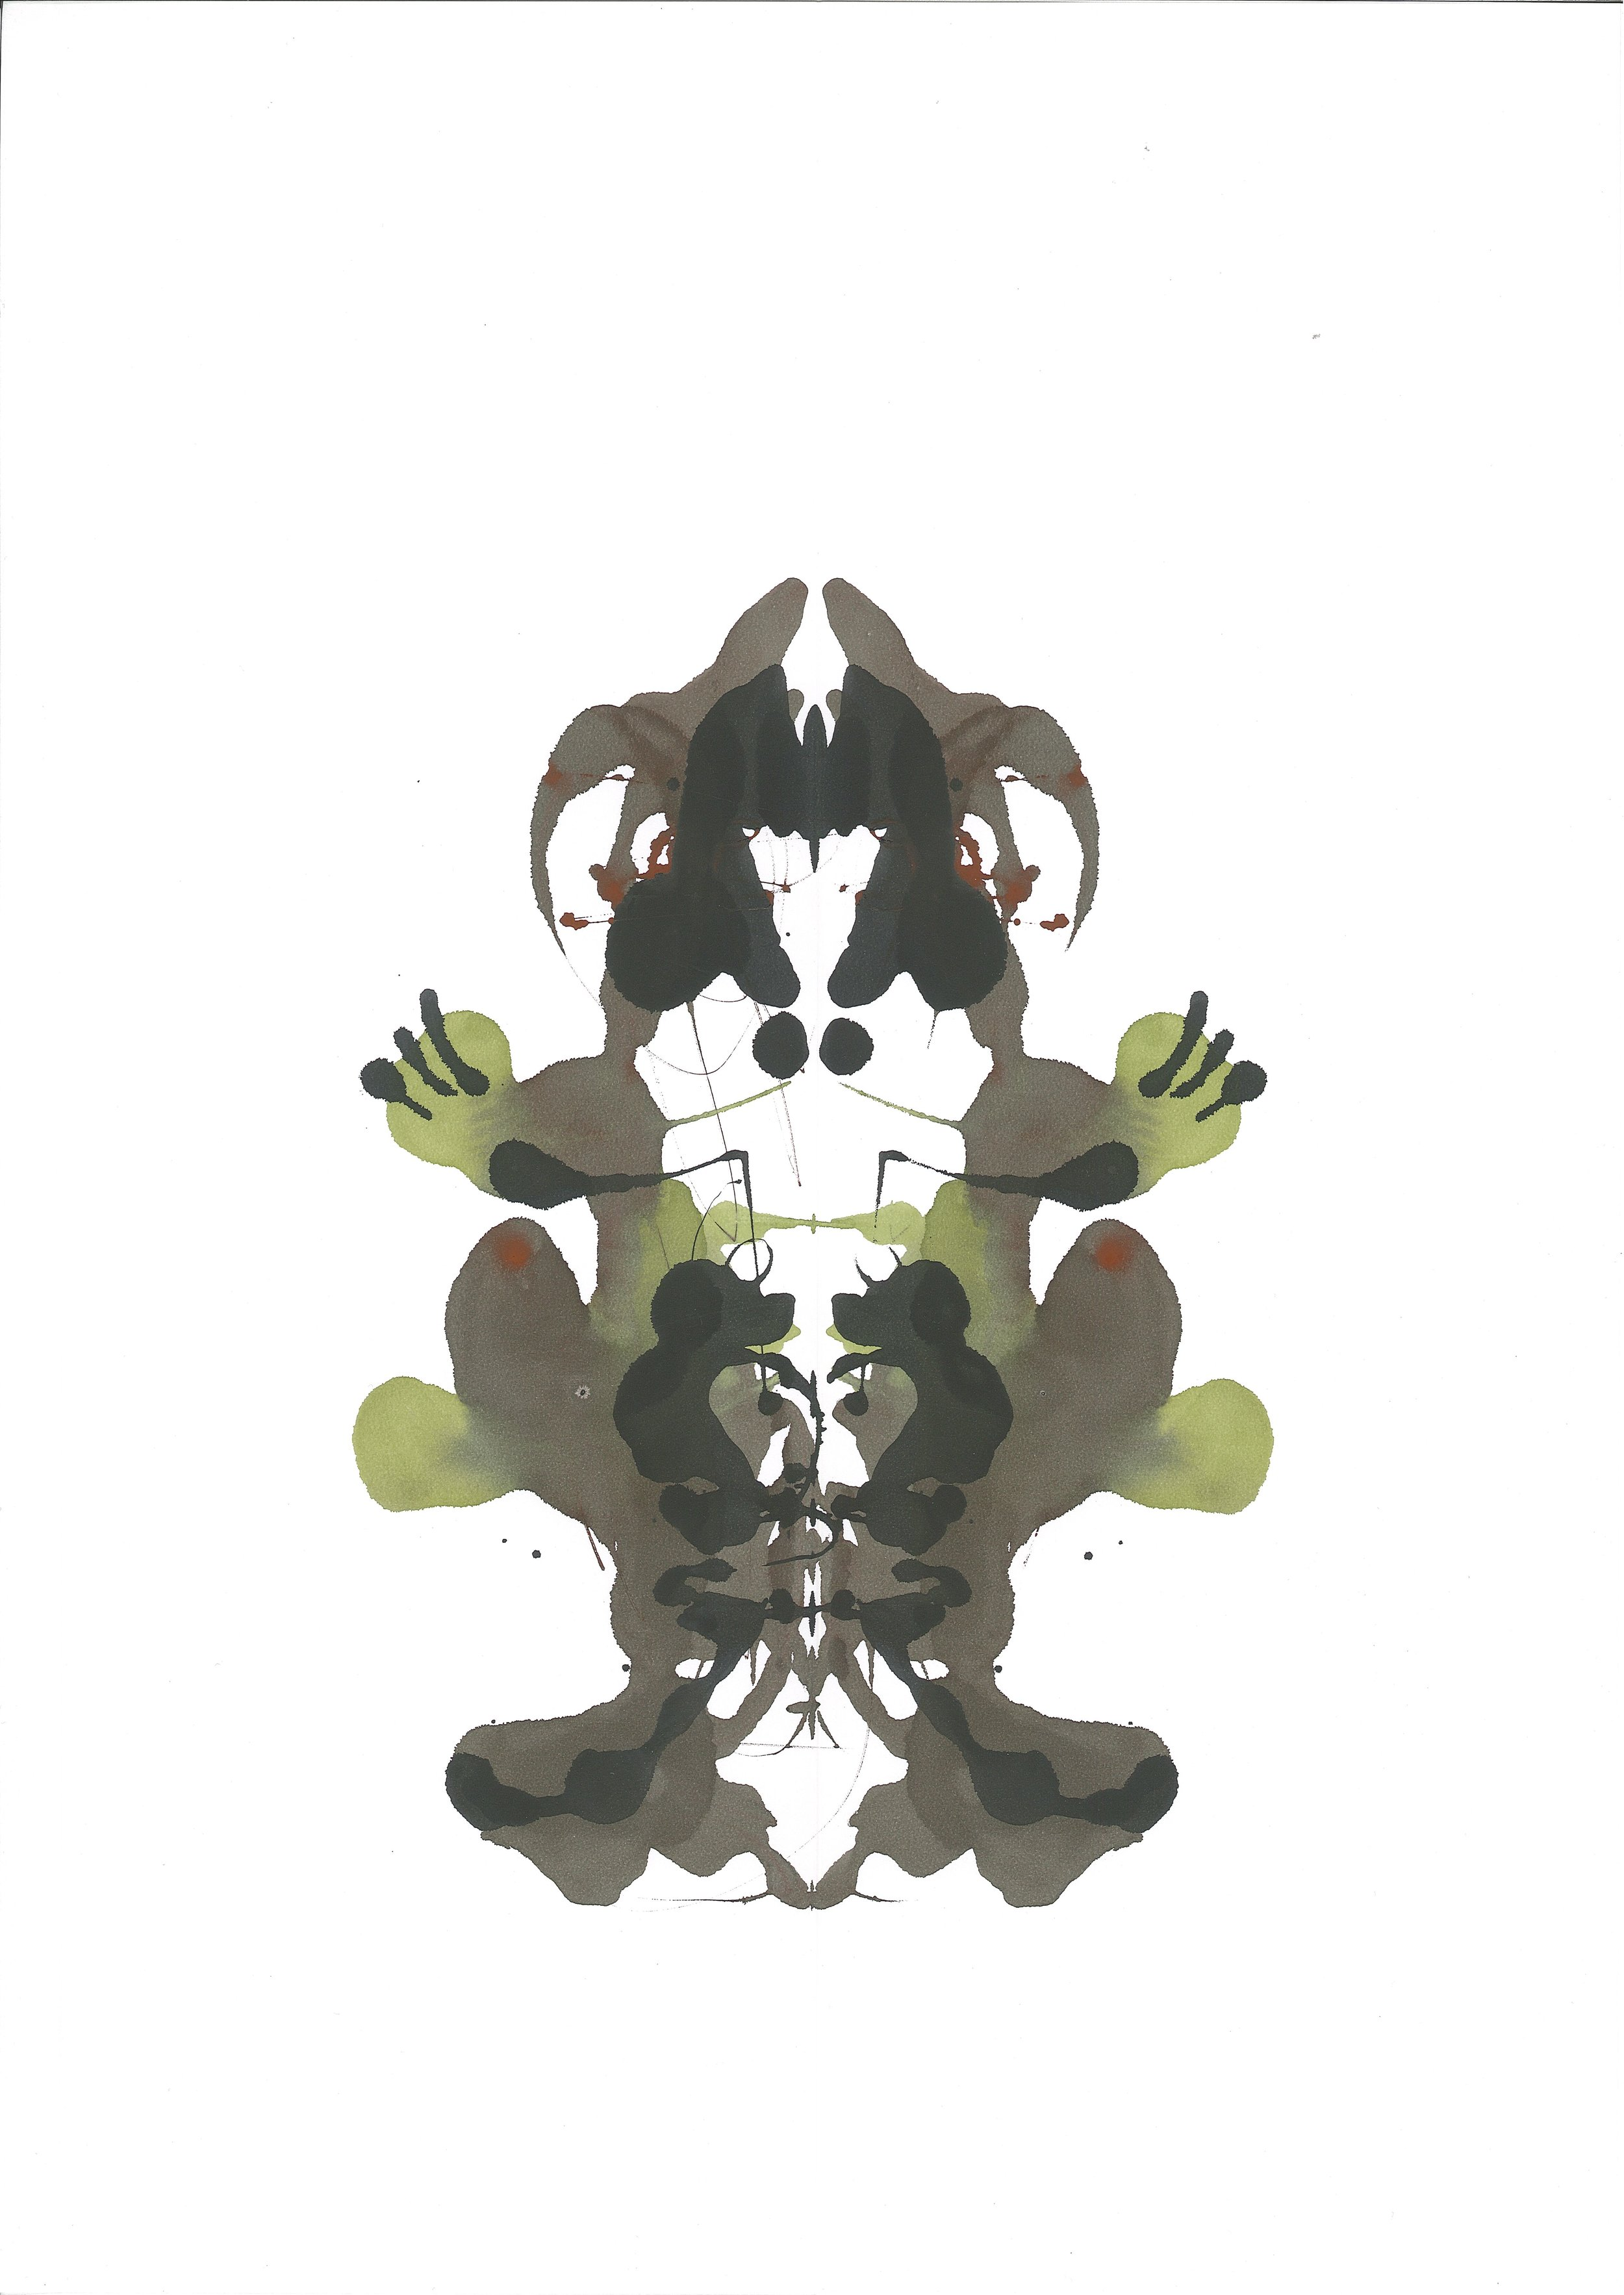 Superkid, gouache on stonepaper, 42x30cm